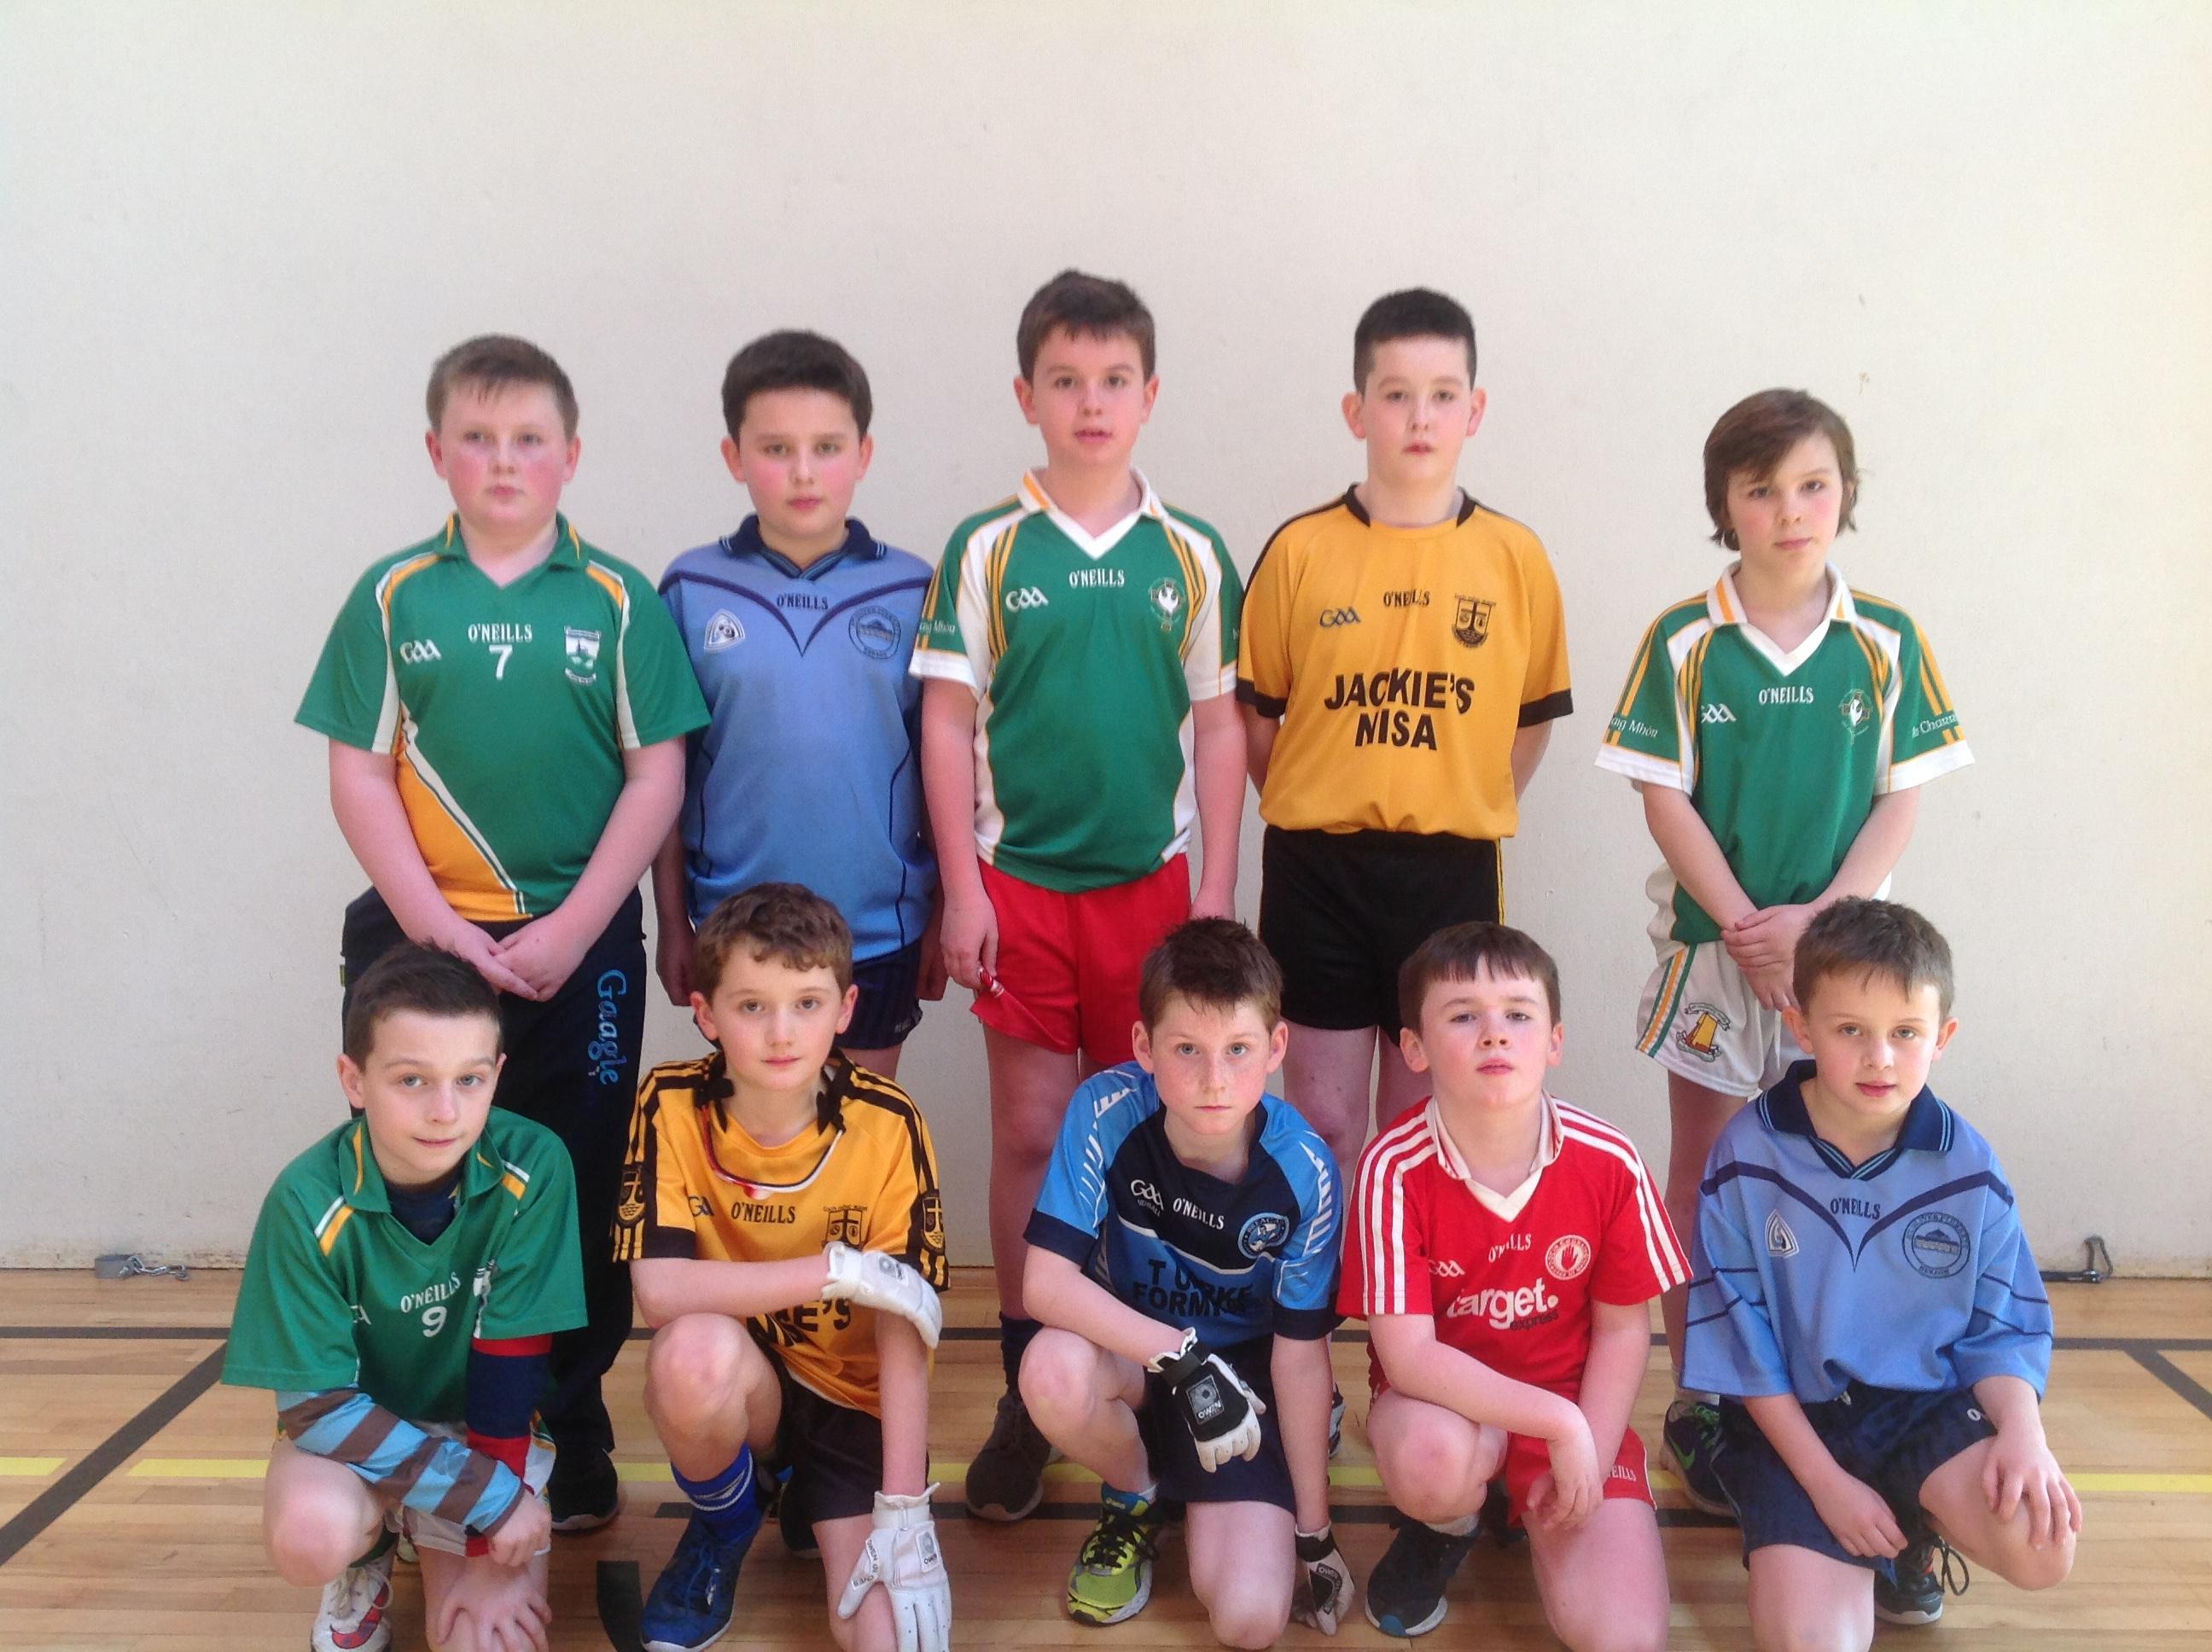 Allianz Cumann na mBunscol Thír Eoghain:4 Wall Handball Tyrone Finals 2016